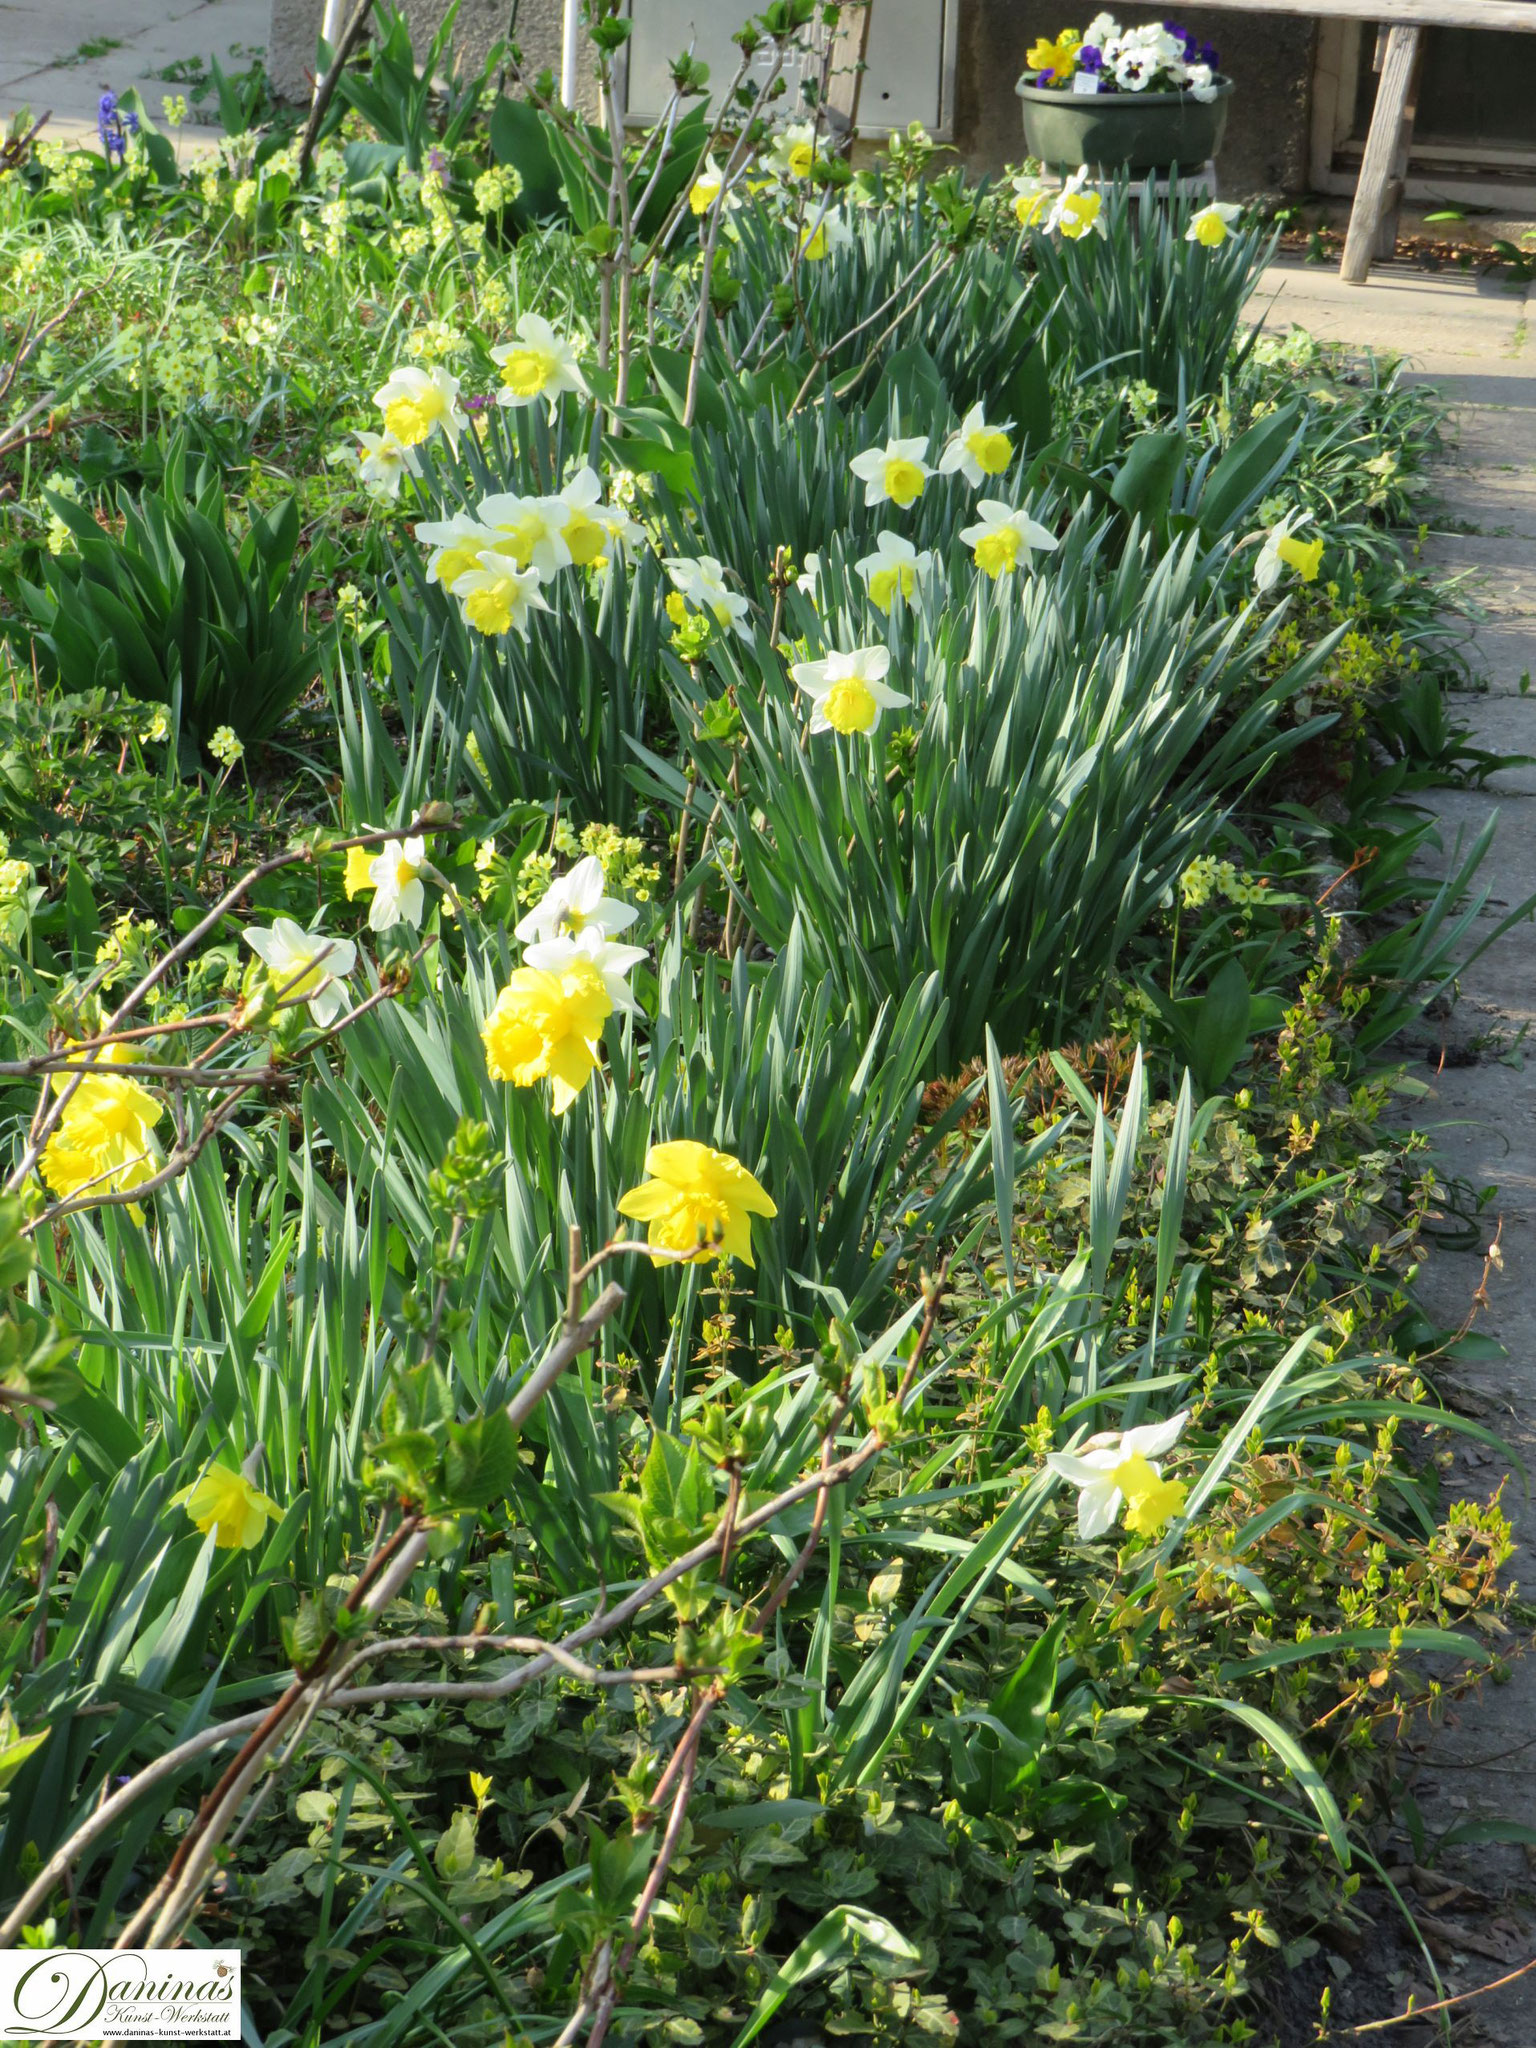 Garten im Frühling - Frühlingsblumen im Beet. Gelbe Märzenbecher.